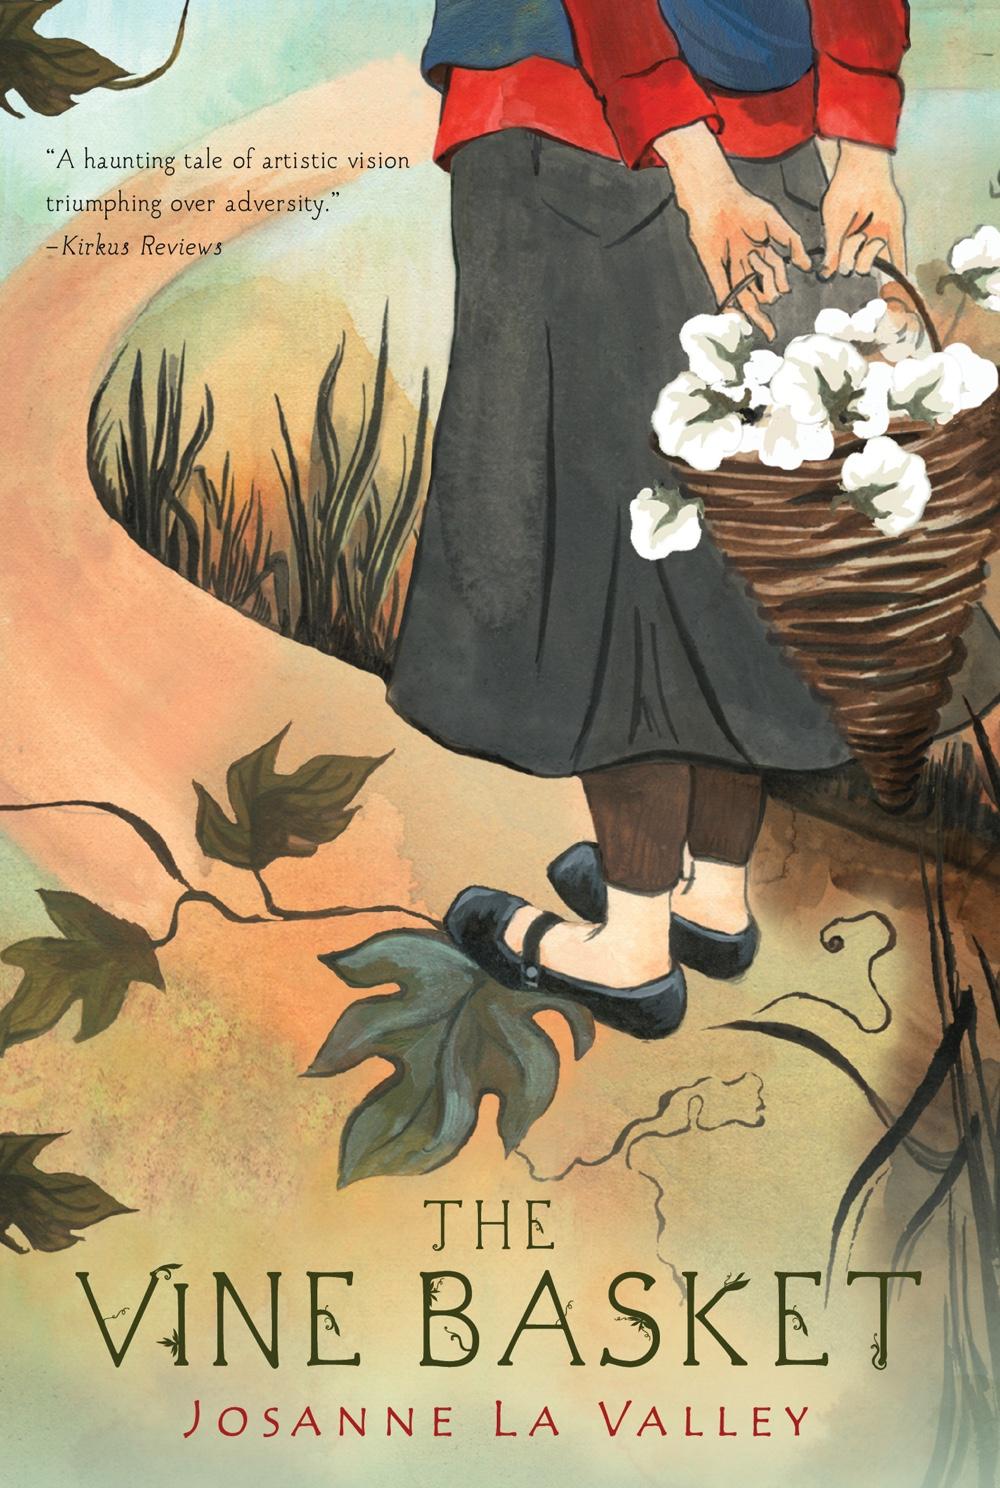 The Vine Basket | Josanne La Valley | Book Review